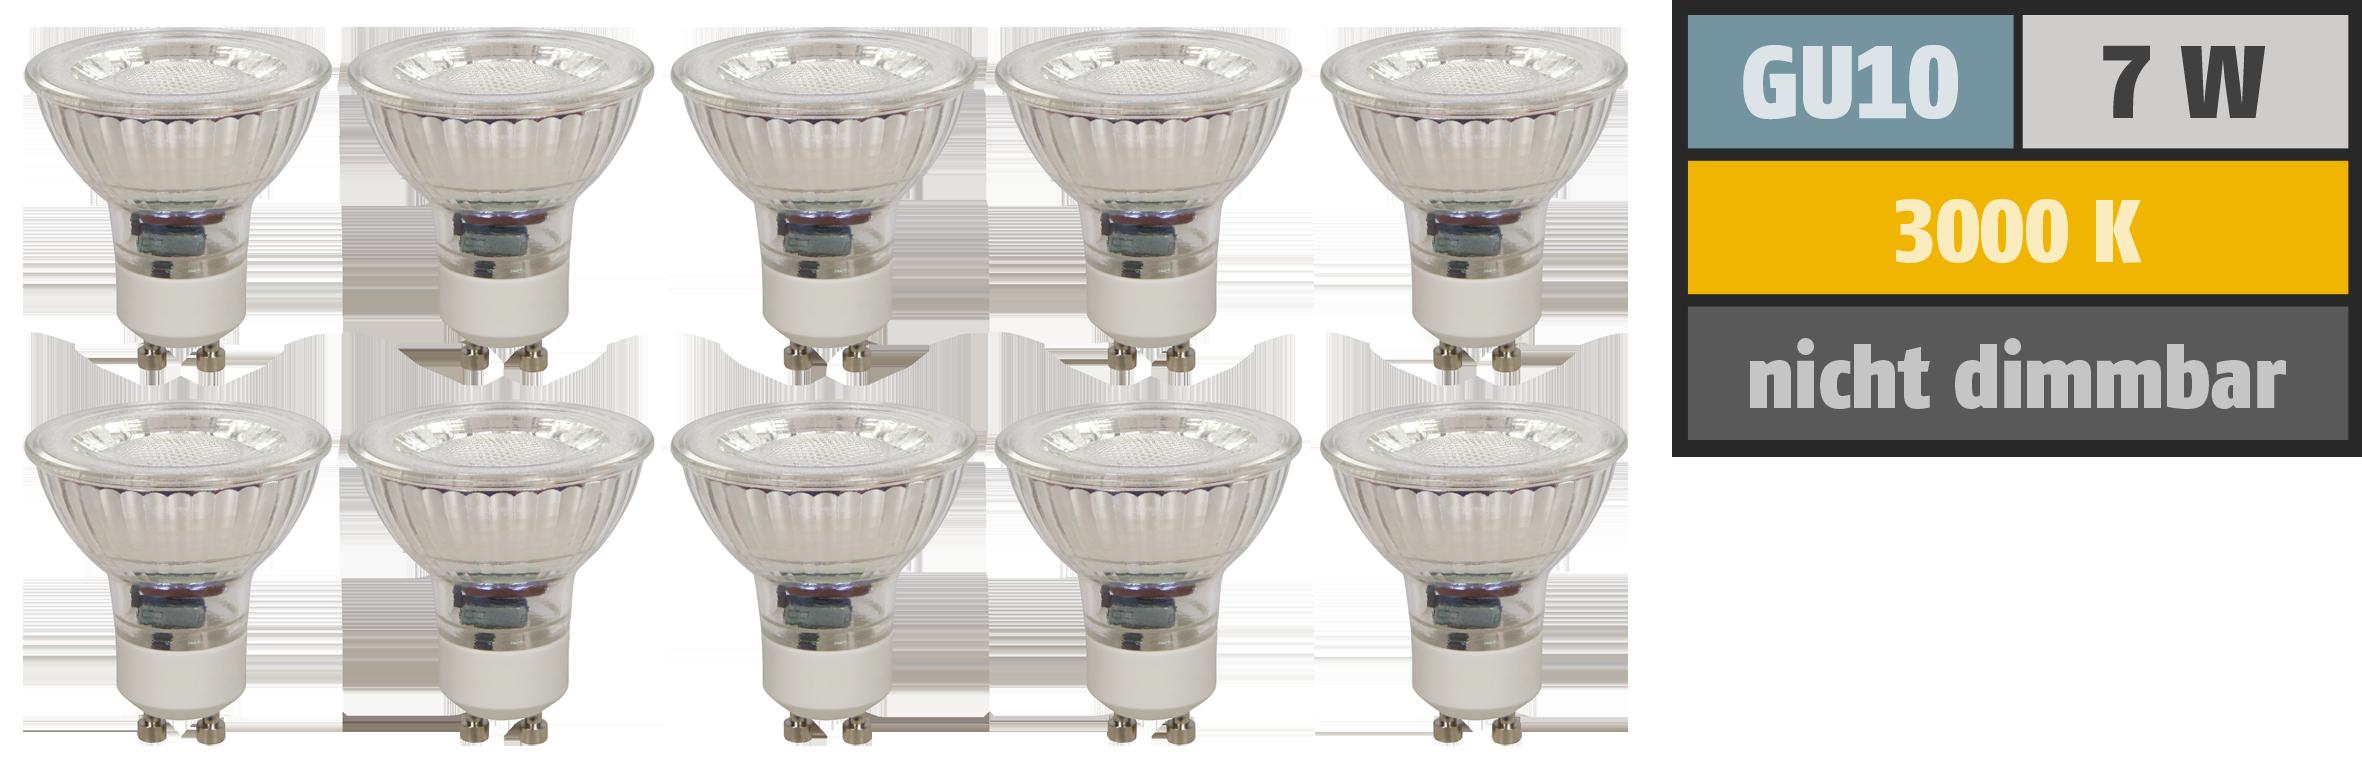 LED-Strahler McShine ''MCOB'' GU10, 7W, 550 lm, warmweiß, 10er-Pack